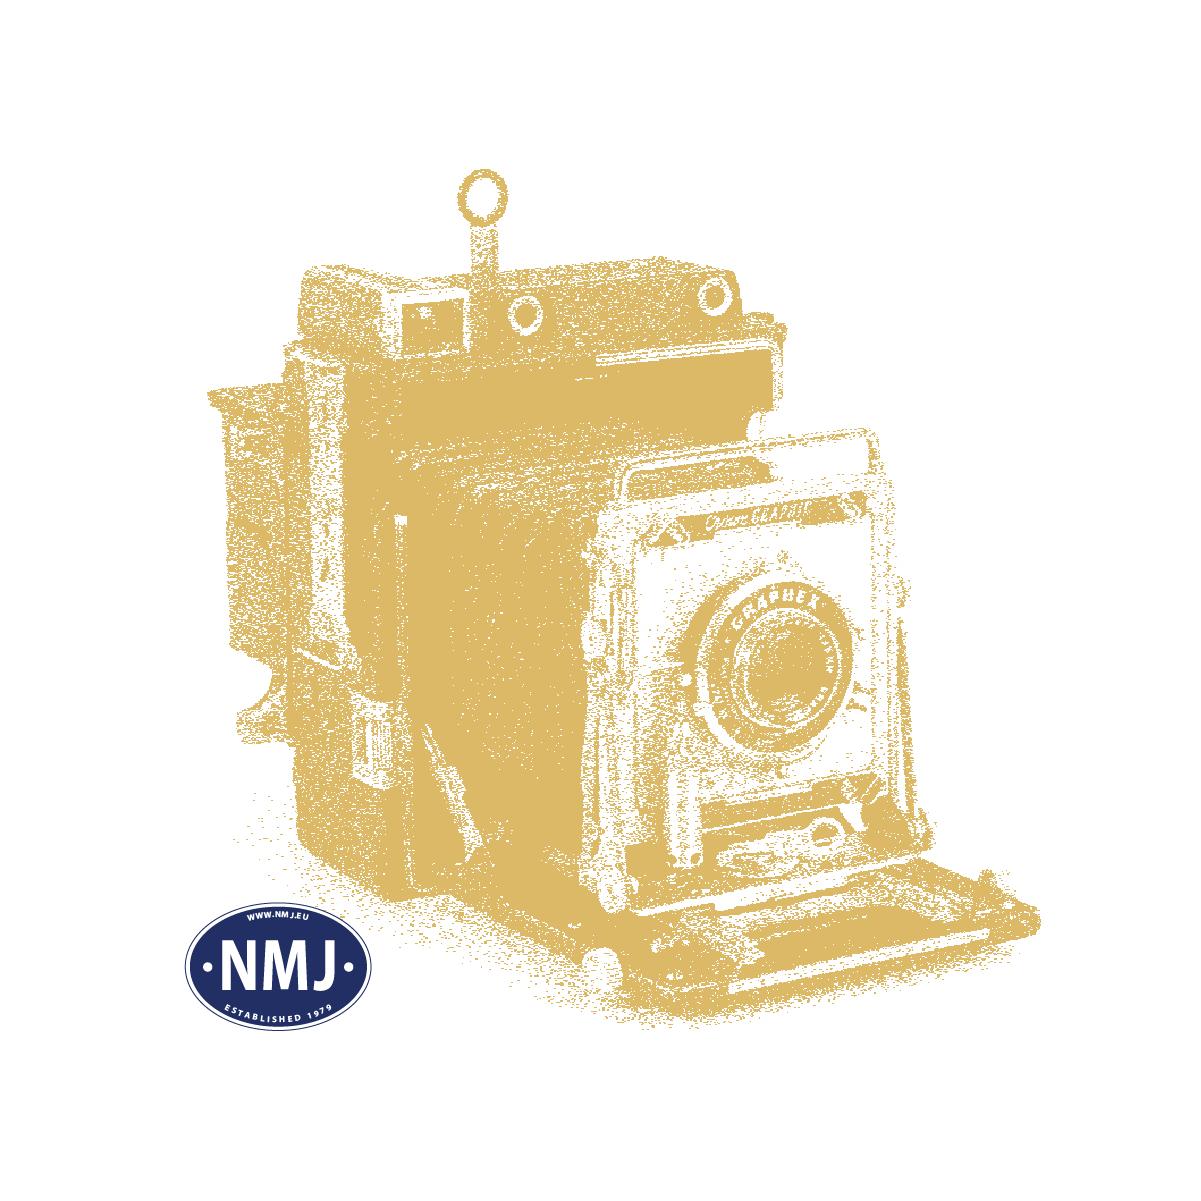 Digital, nmj-topline-245006-nsb-di3a-602-red-black-gm-logo-olympic-games-lillehammer-1994-0-scale-1-45-dcc, ESU58315